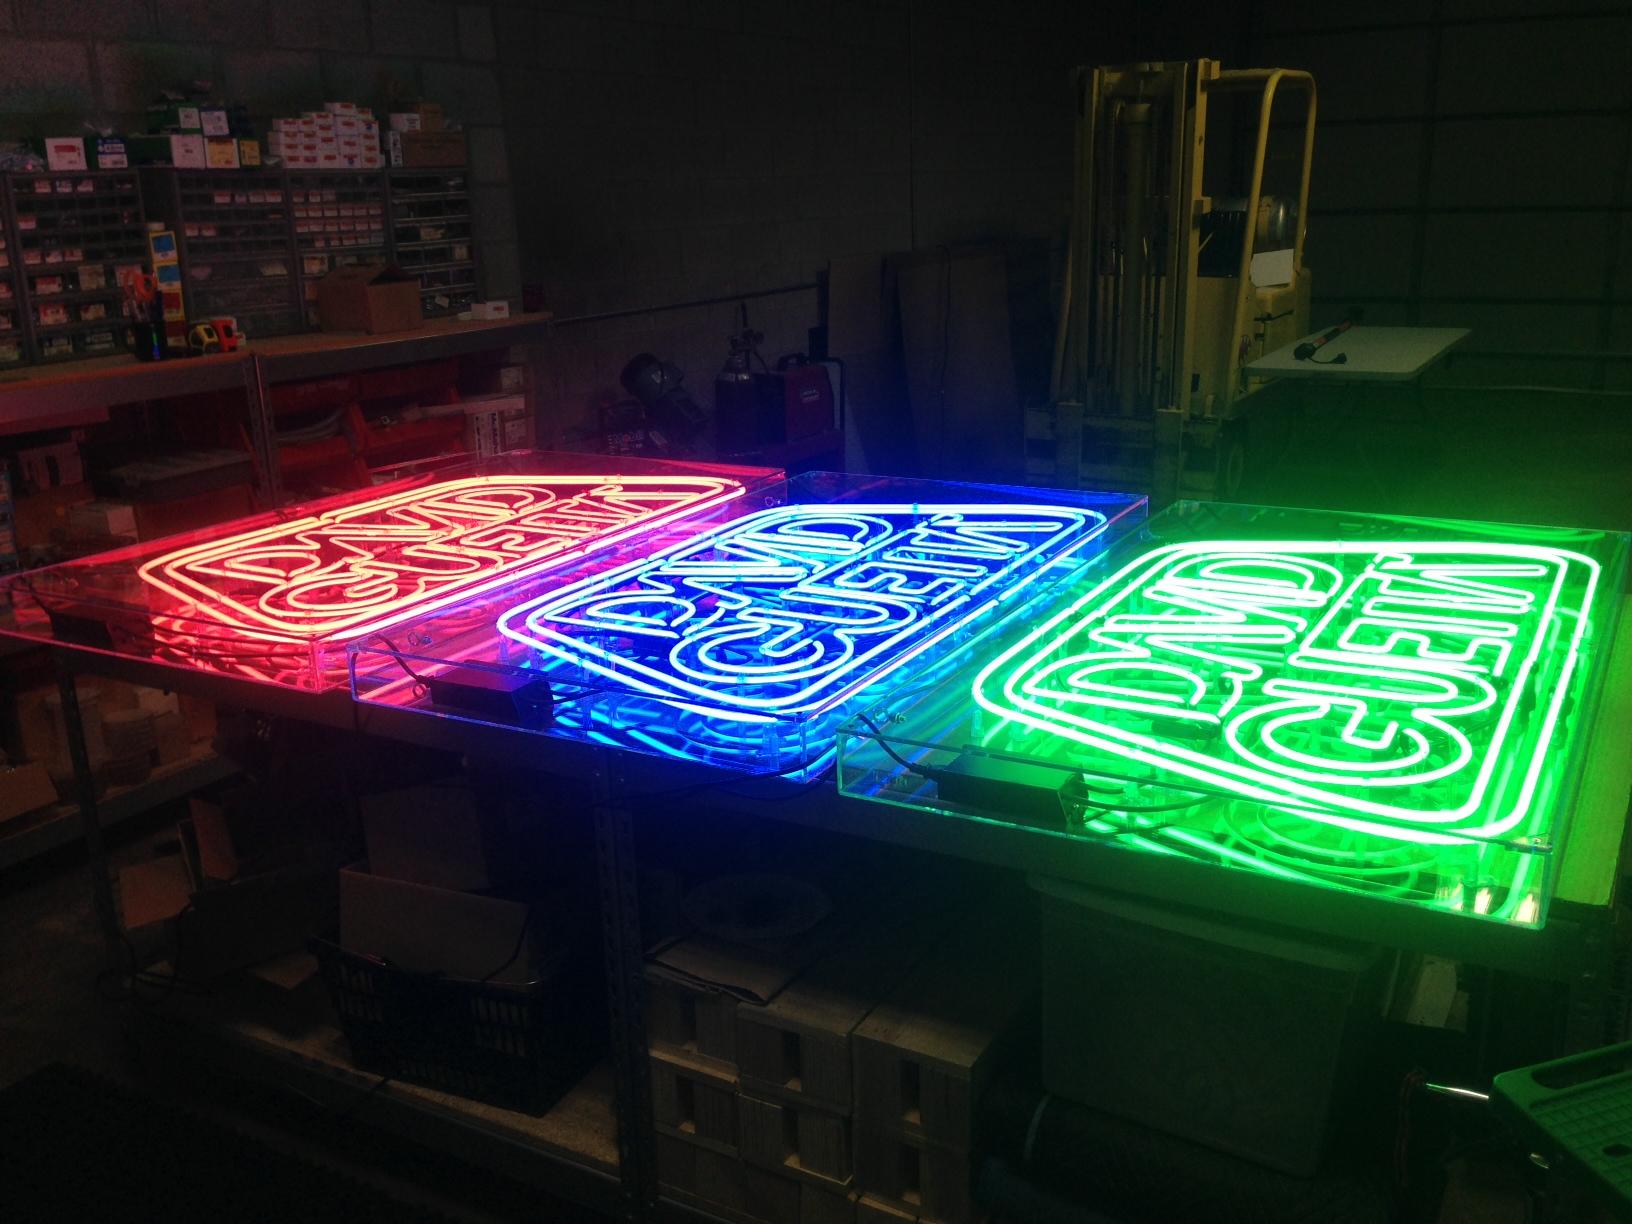 neon-sign3.jpeg